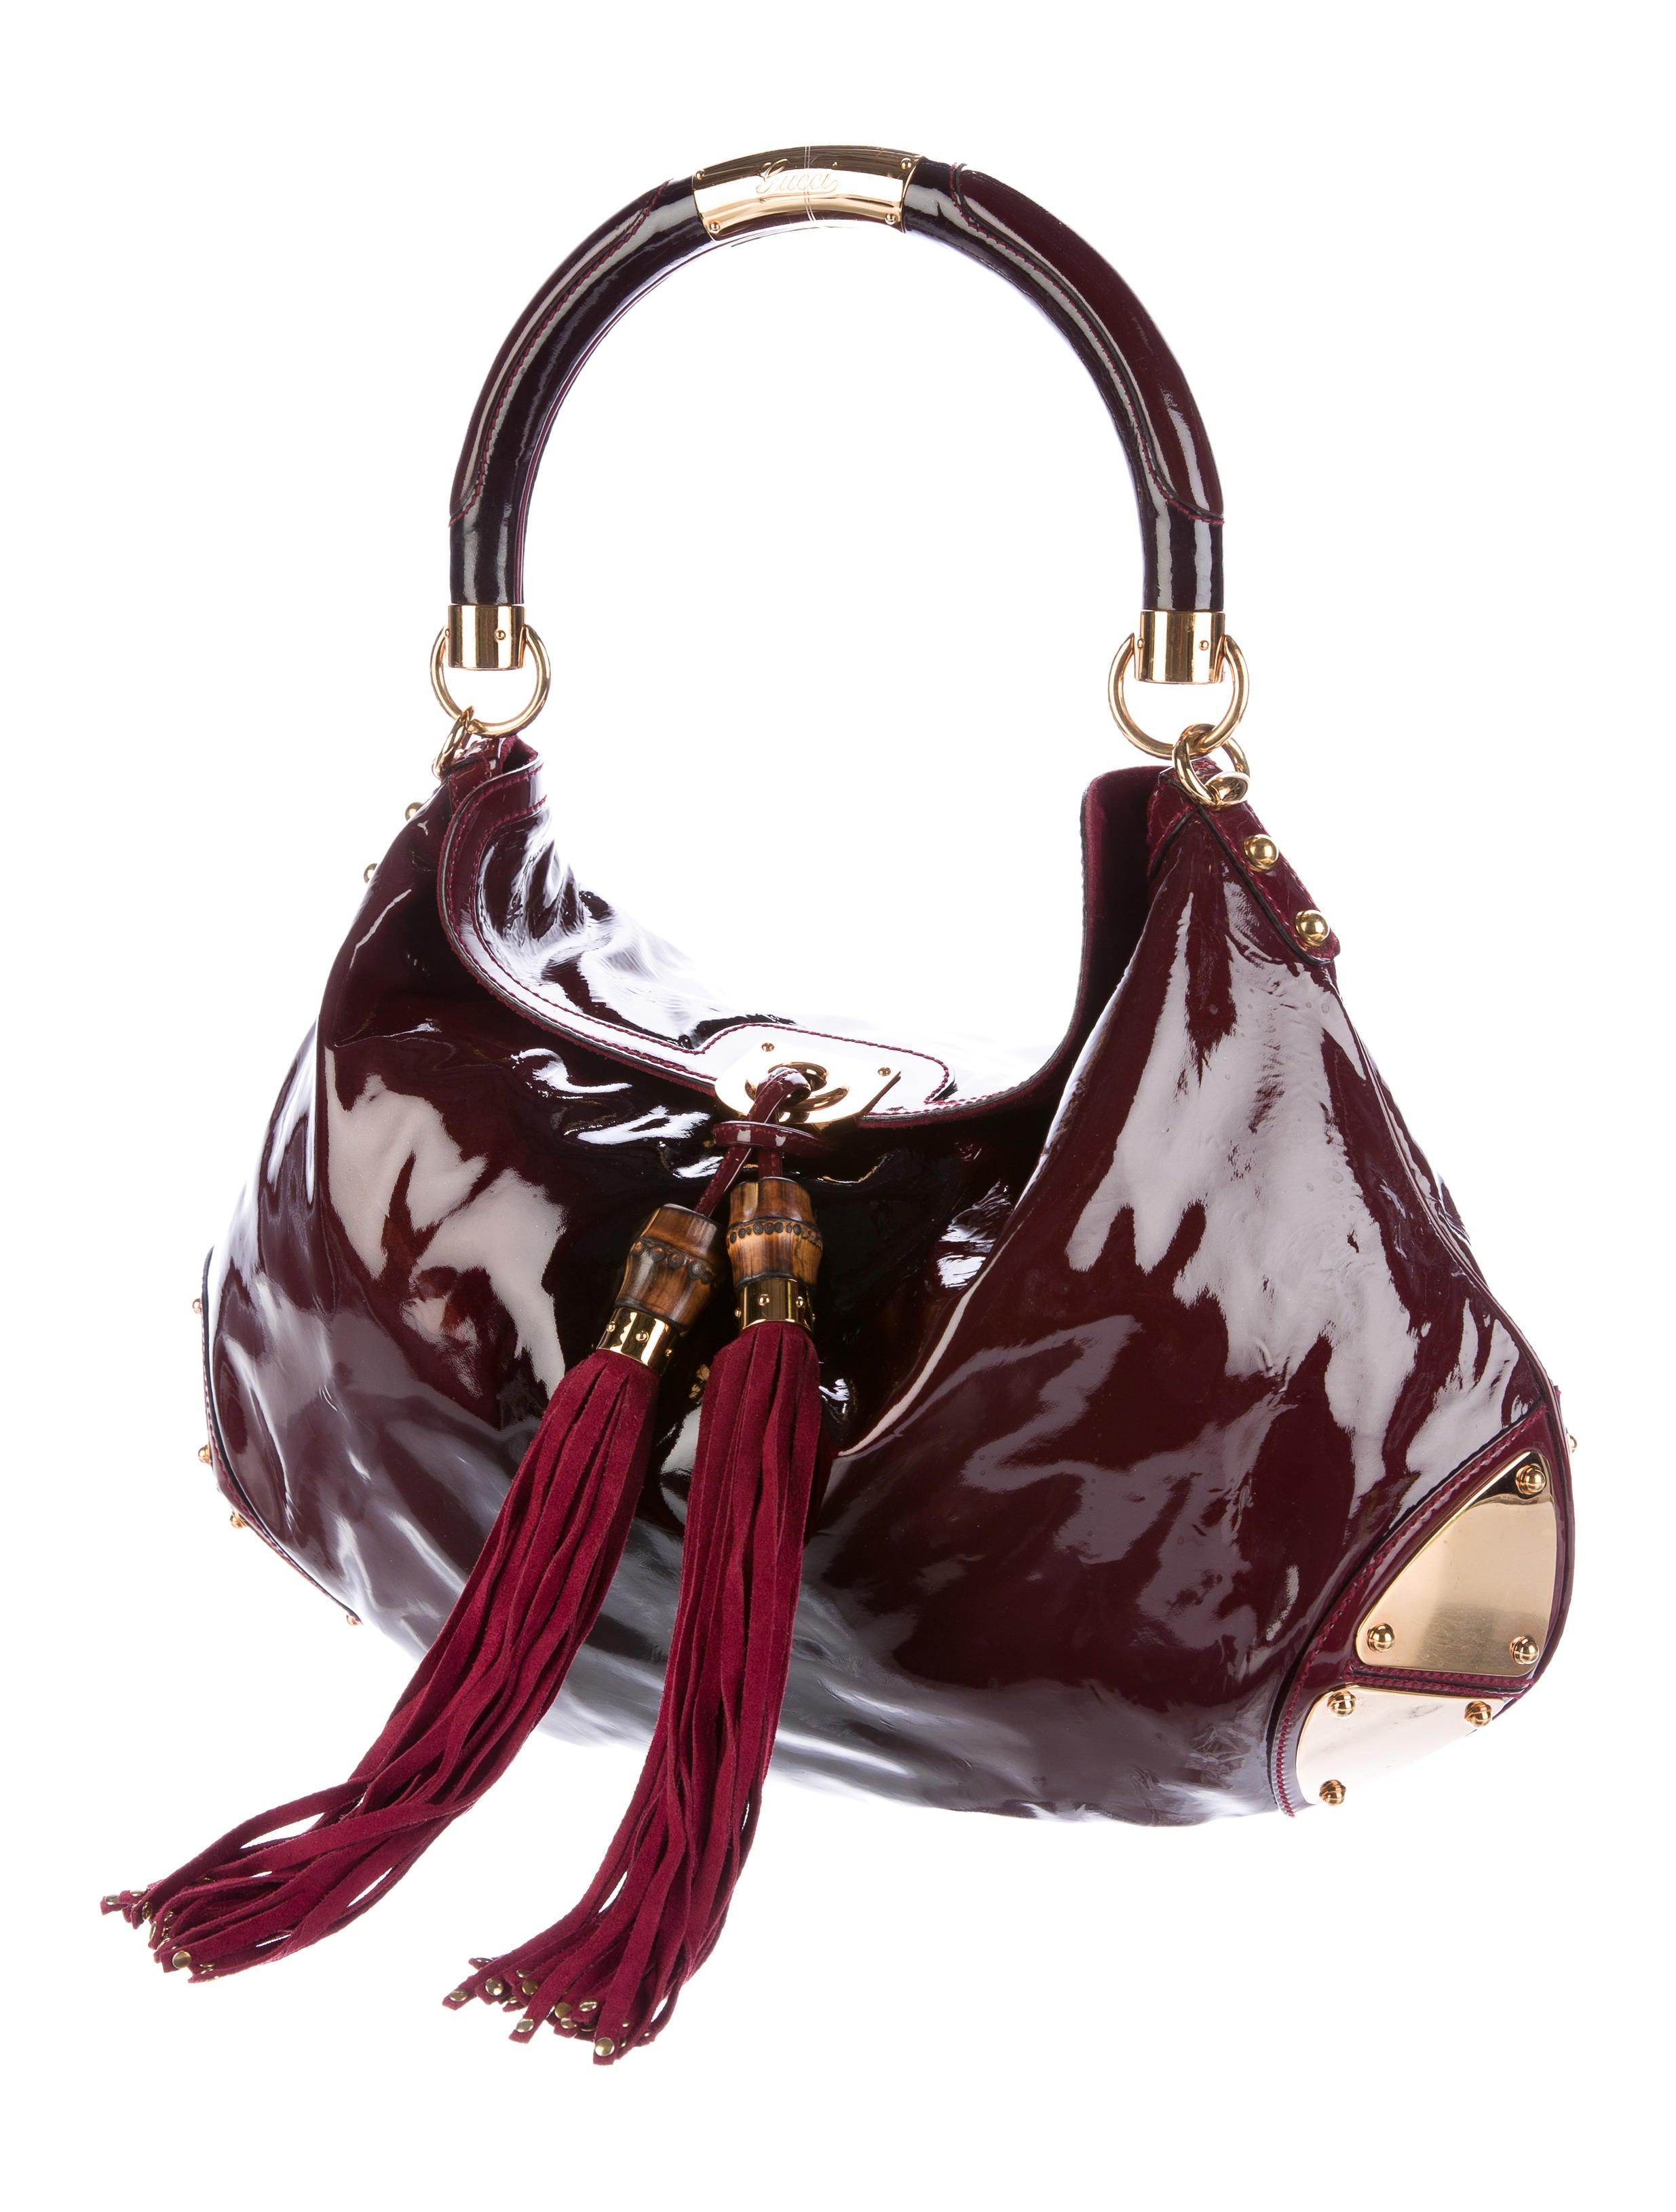 973273ada18 Gucci Patent Leather Purse - Best Purse Image Ccdbb.Org